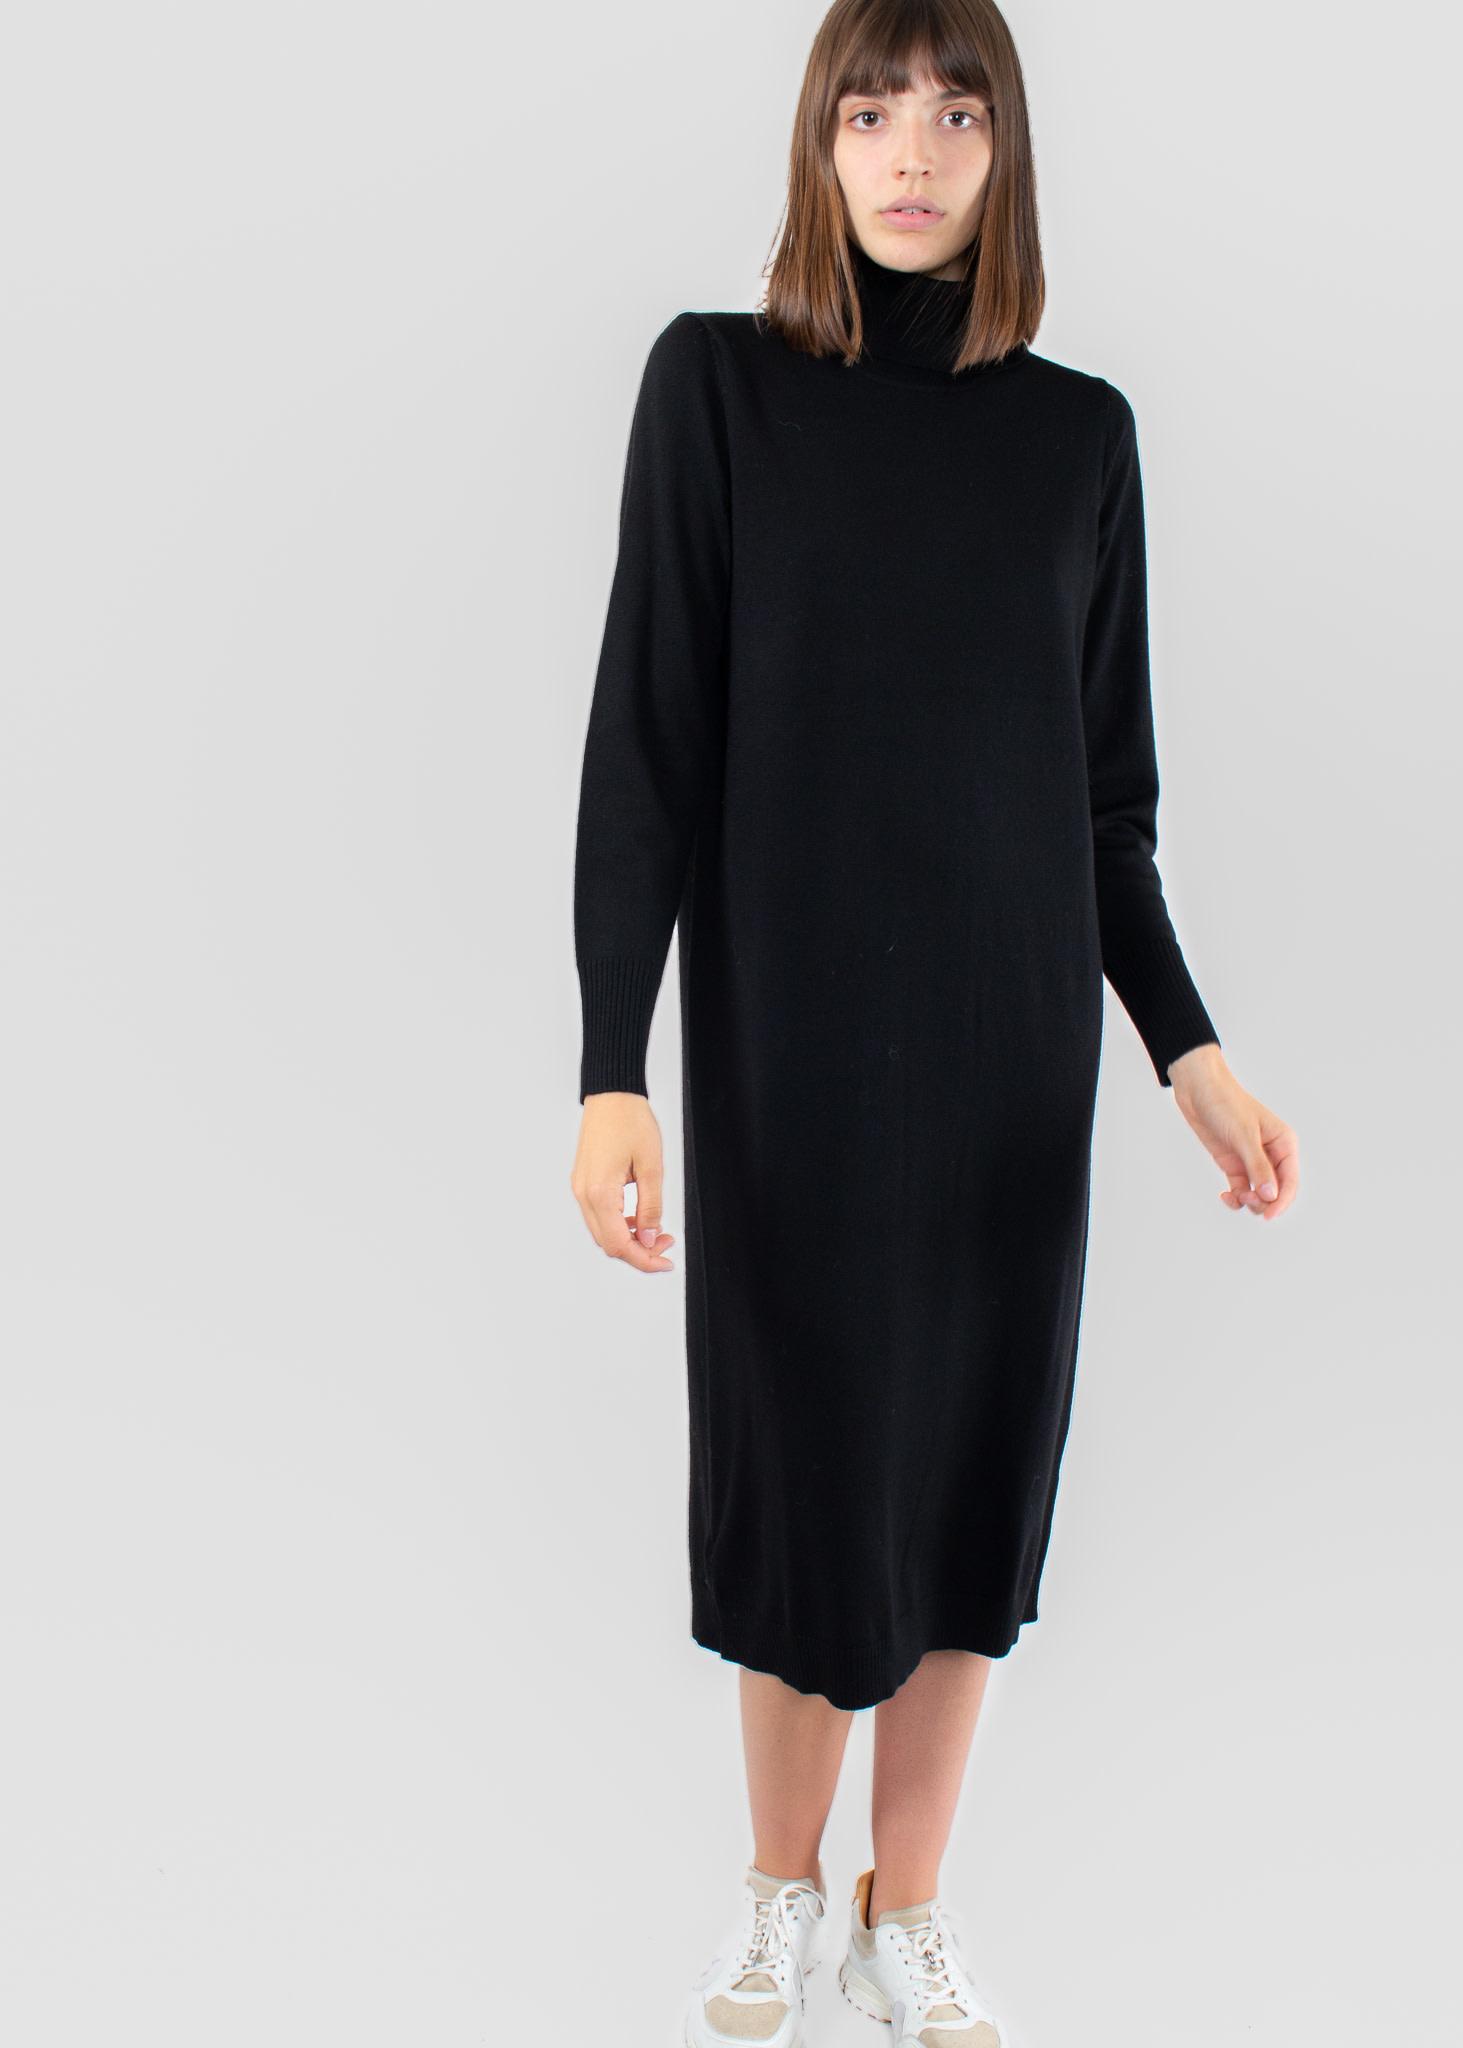 REPEAT 300140 - Robe laine merino